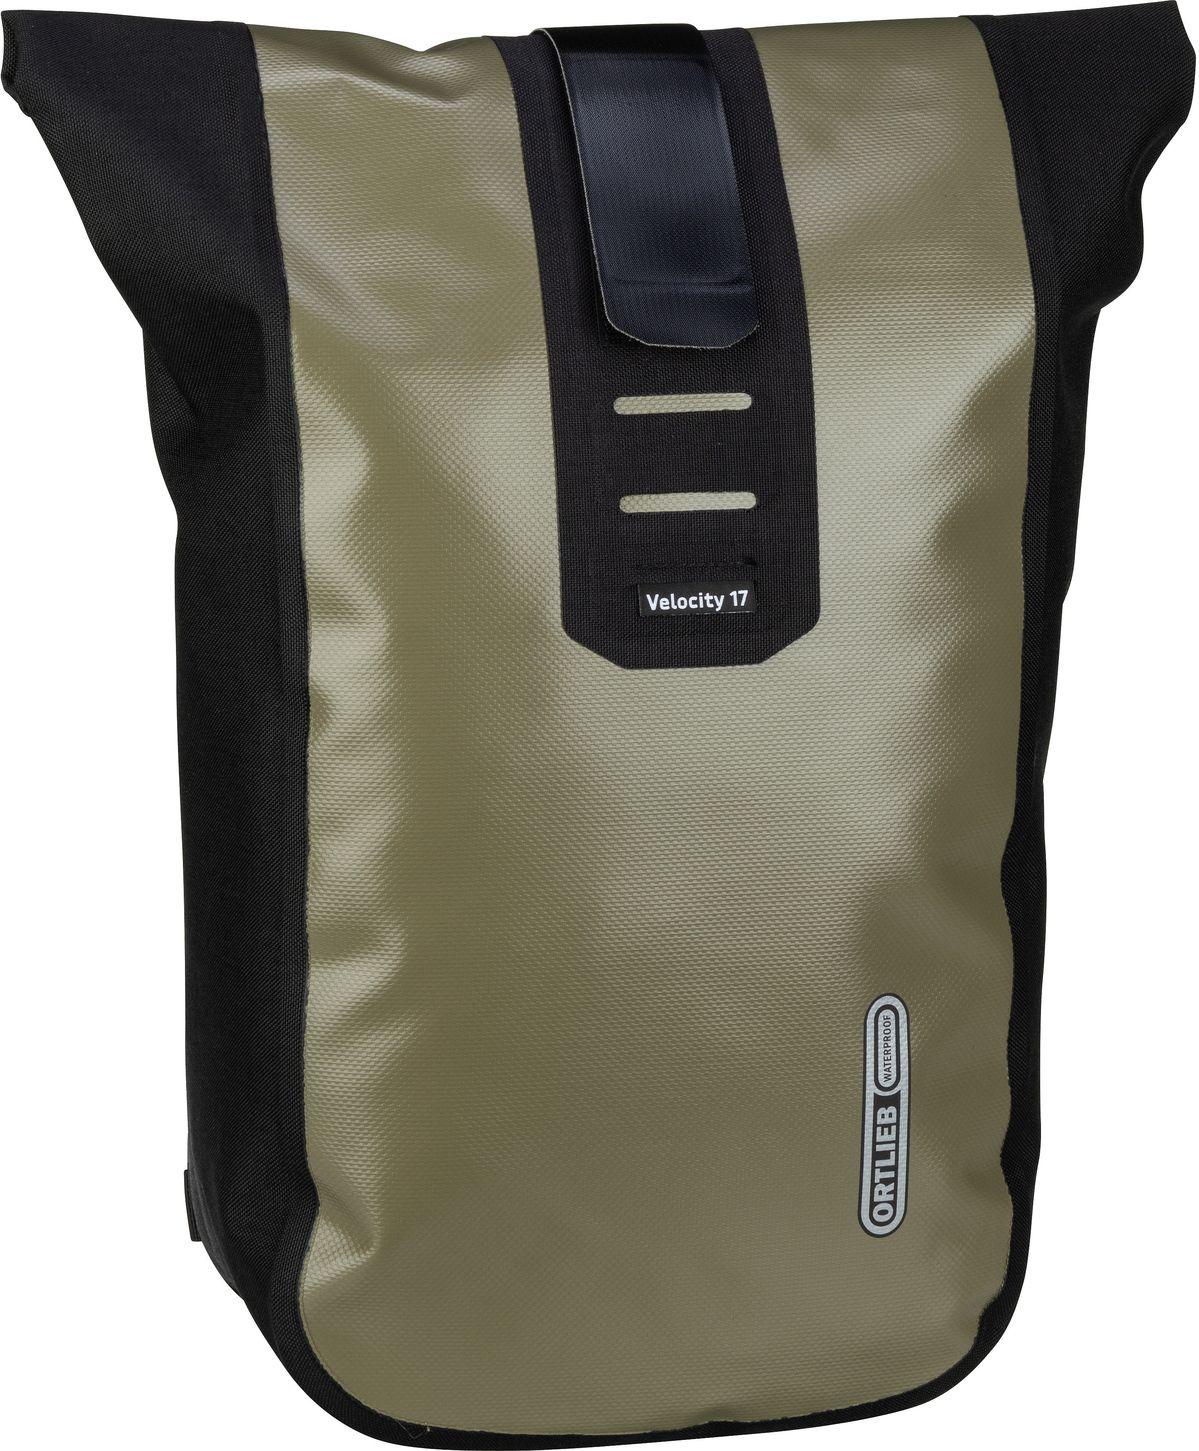 Rucksack / Daypack Velocity 17L Olive-Black (17 Liter)